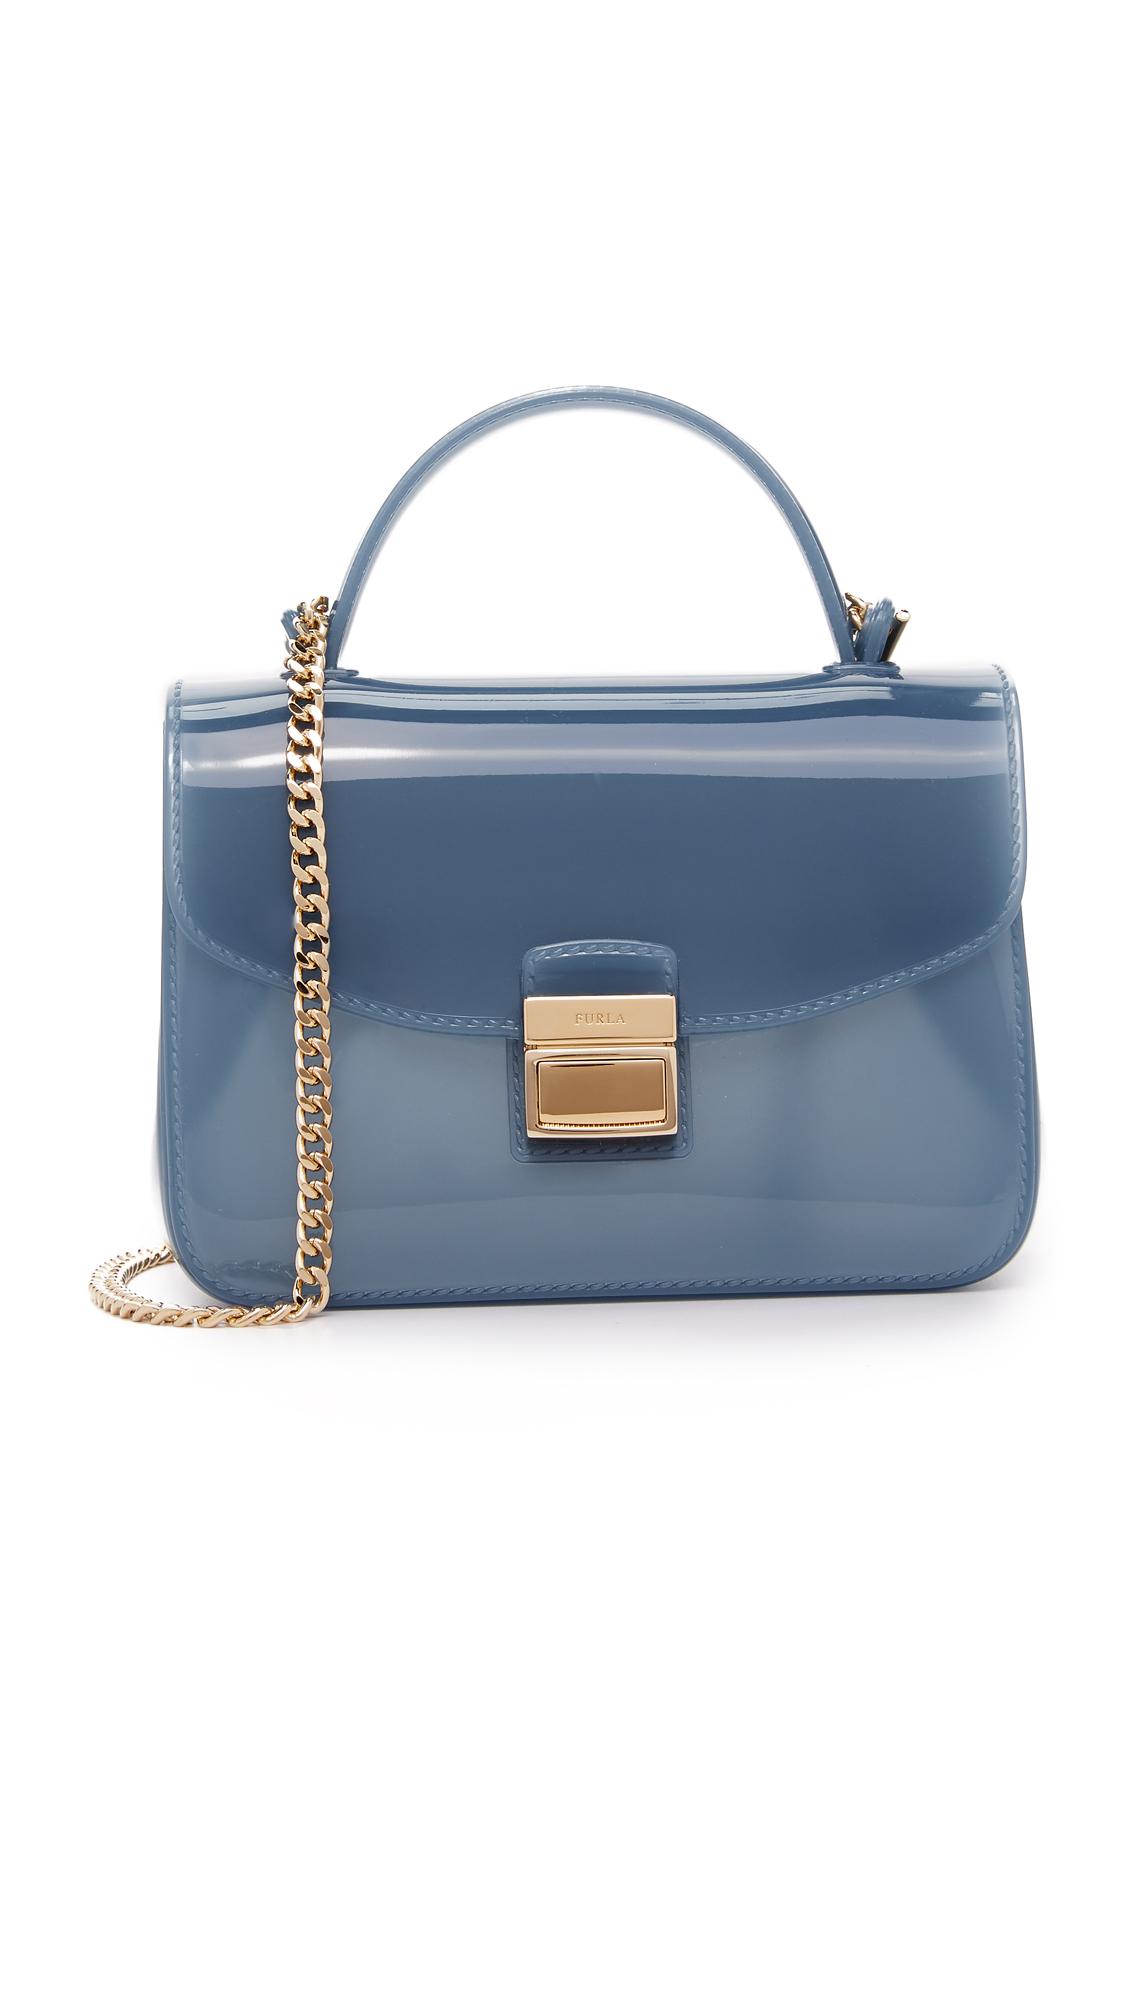 Fashion week Candy furla bags for lady